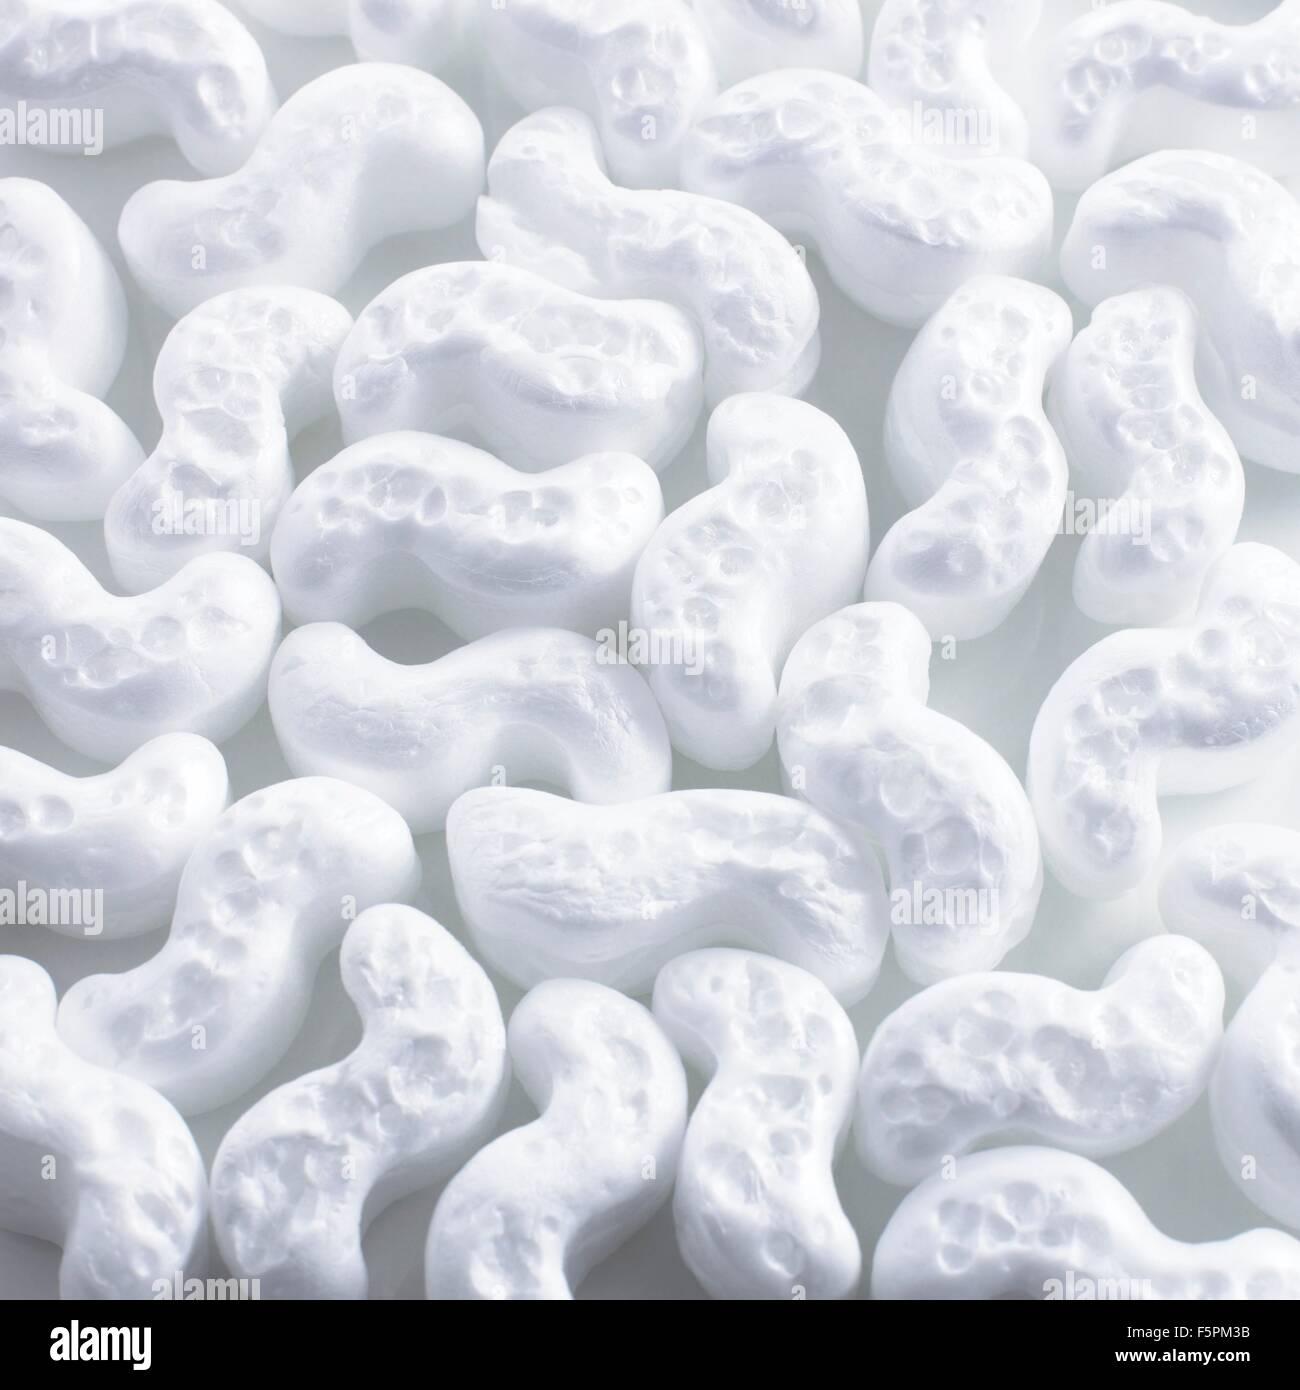 Matériaux d'emballage en polystyrène. Photo Stock